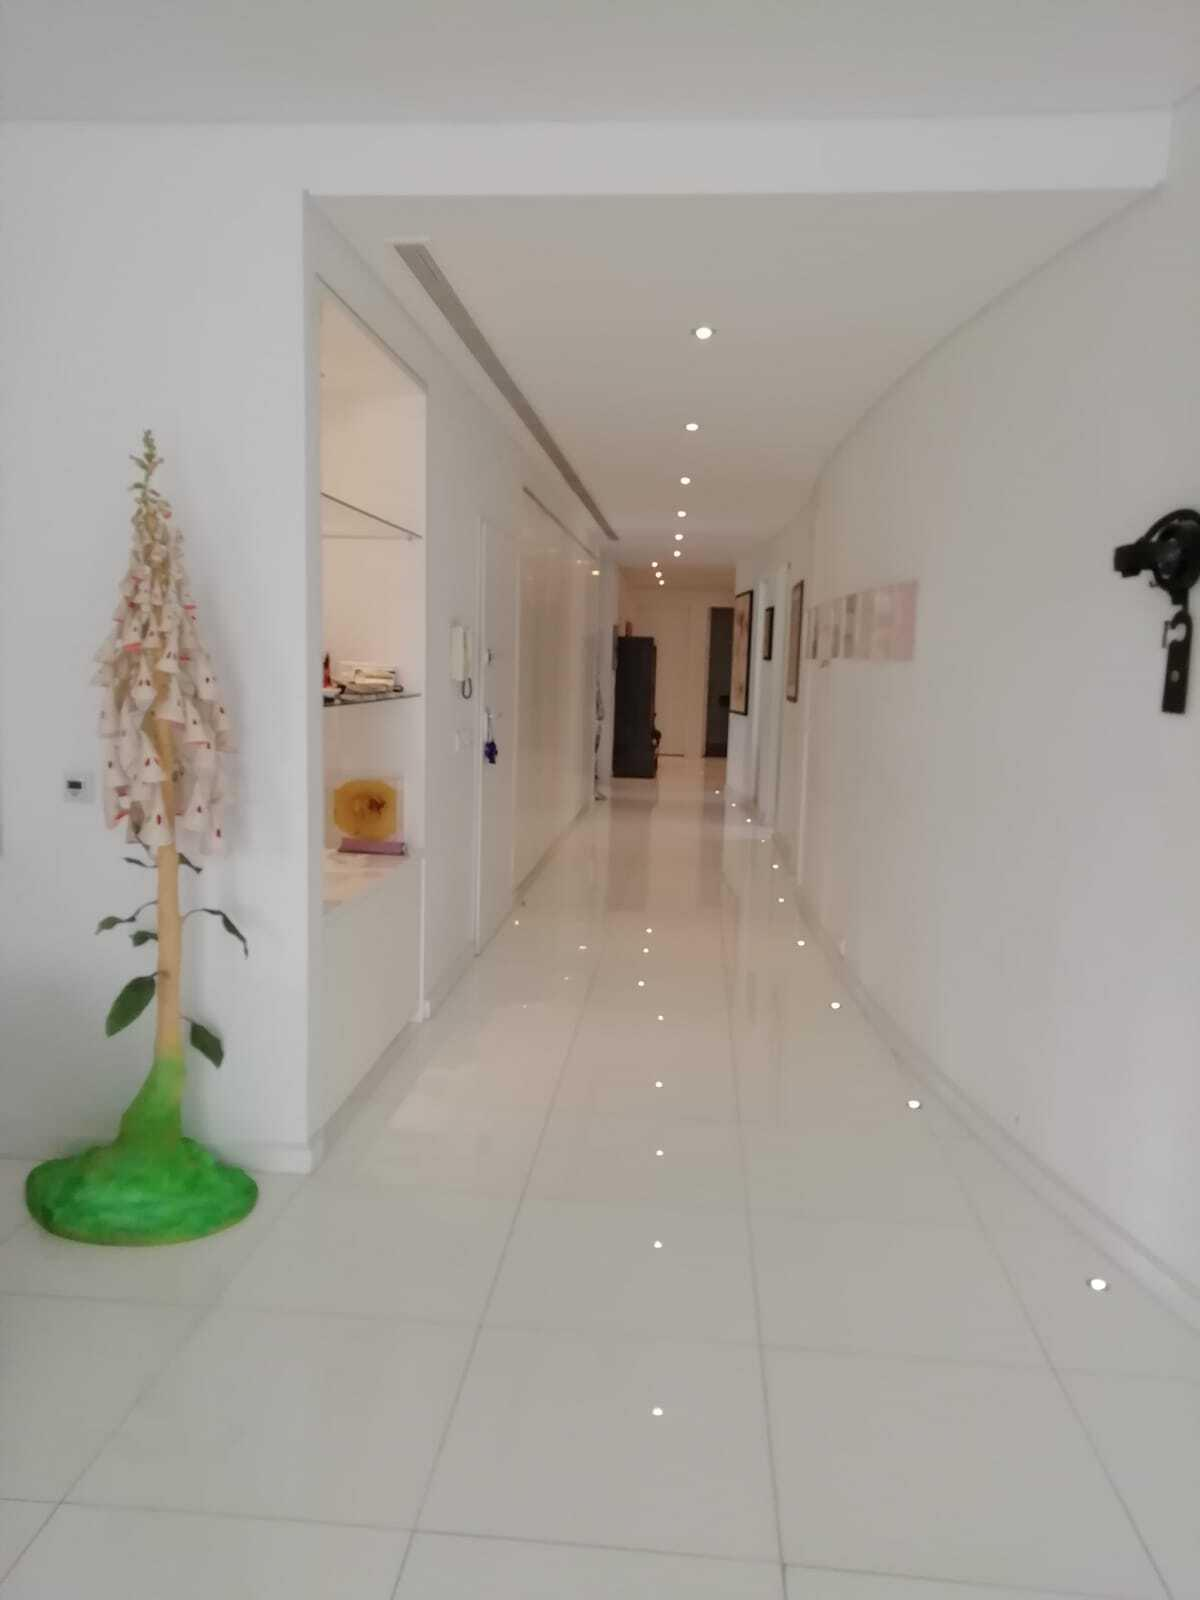 pf18758-apartamento-t6-lisboa-2e841971-534f-4157-9c77-a3e4a624f3cc